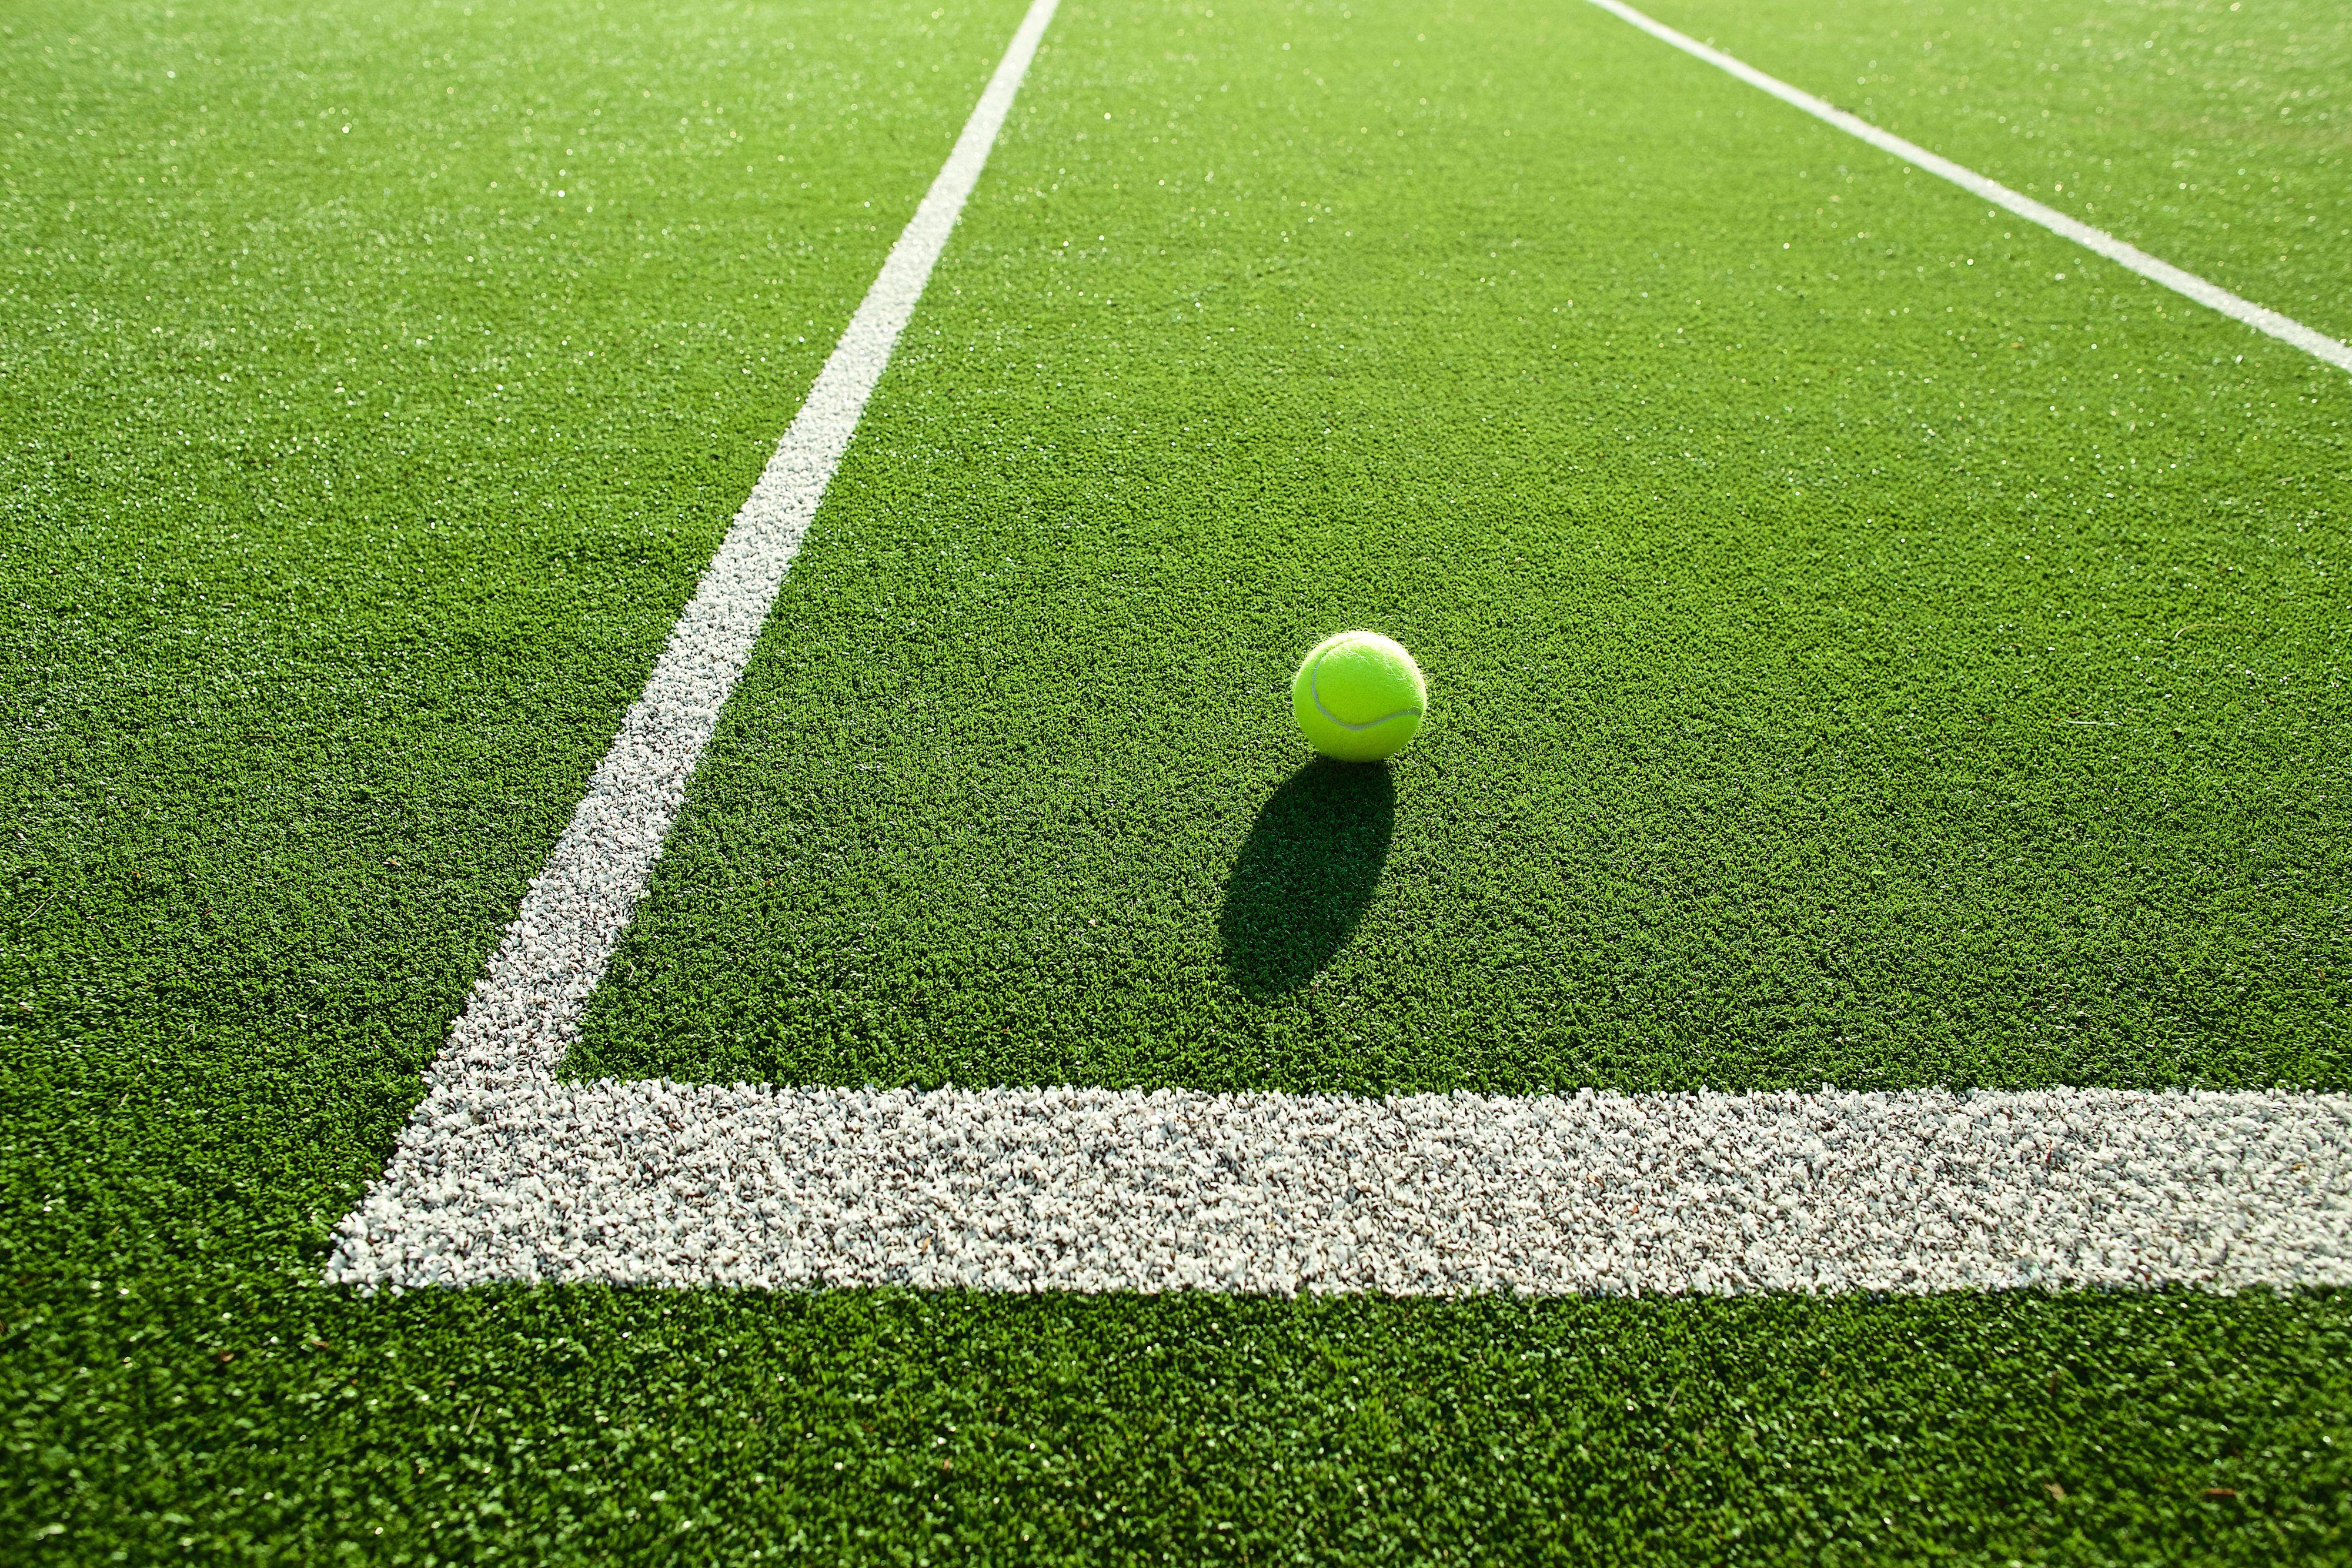 tennis ball_lower res_shutterstock_303271421 copy